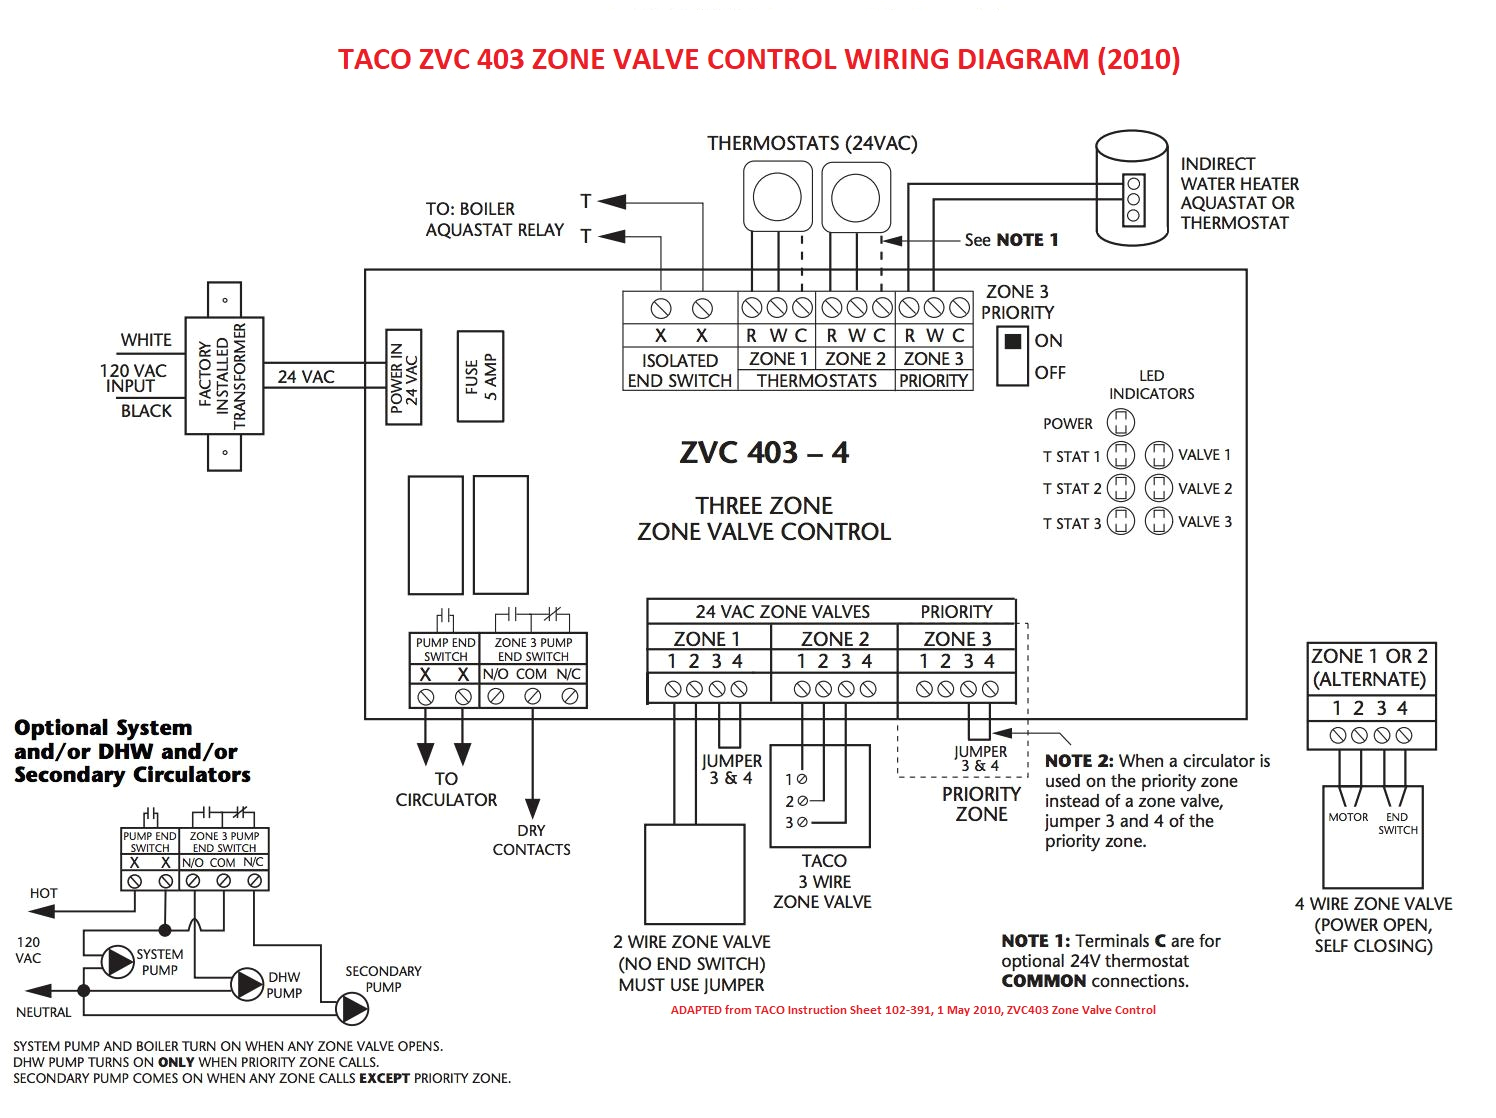 ross 411b04 ross industrial controls ross lockout valve ross safety valves ross safety air dump valve jpg